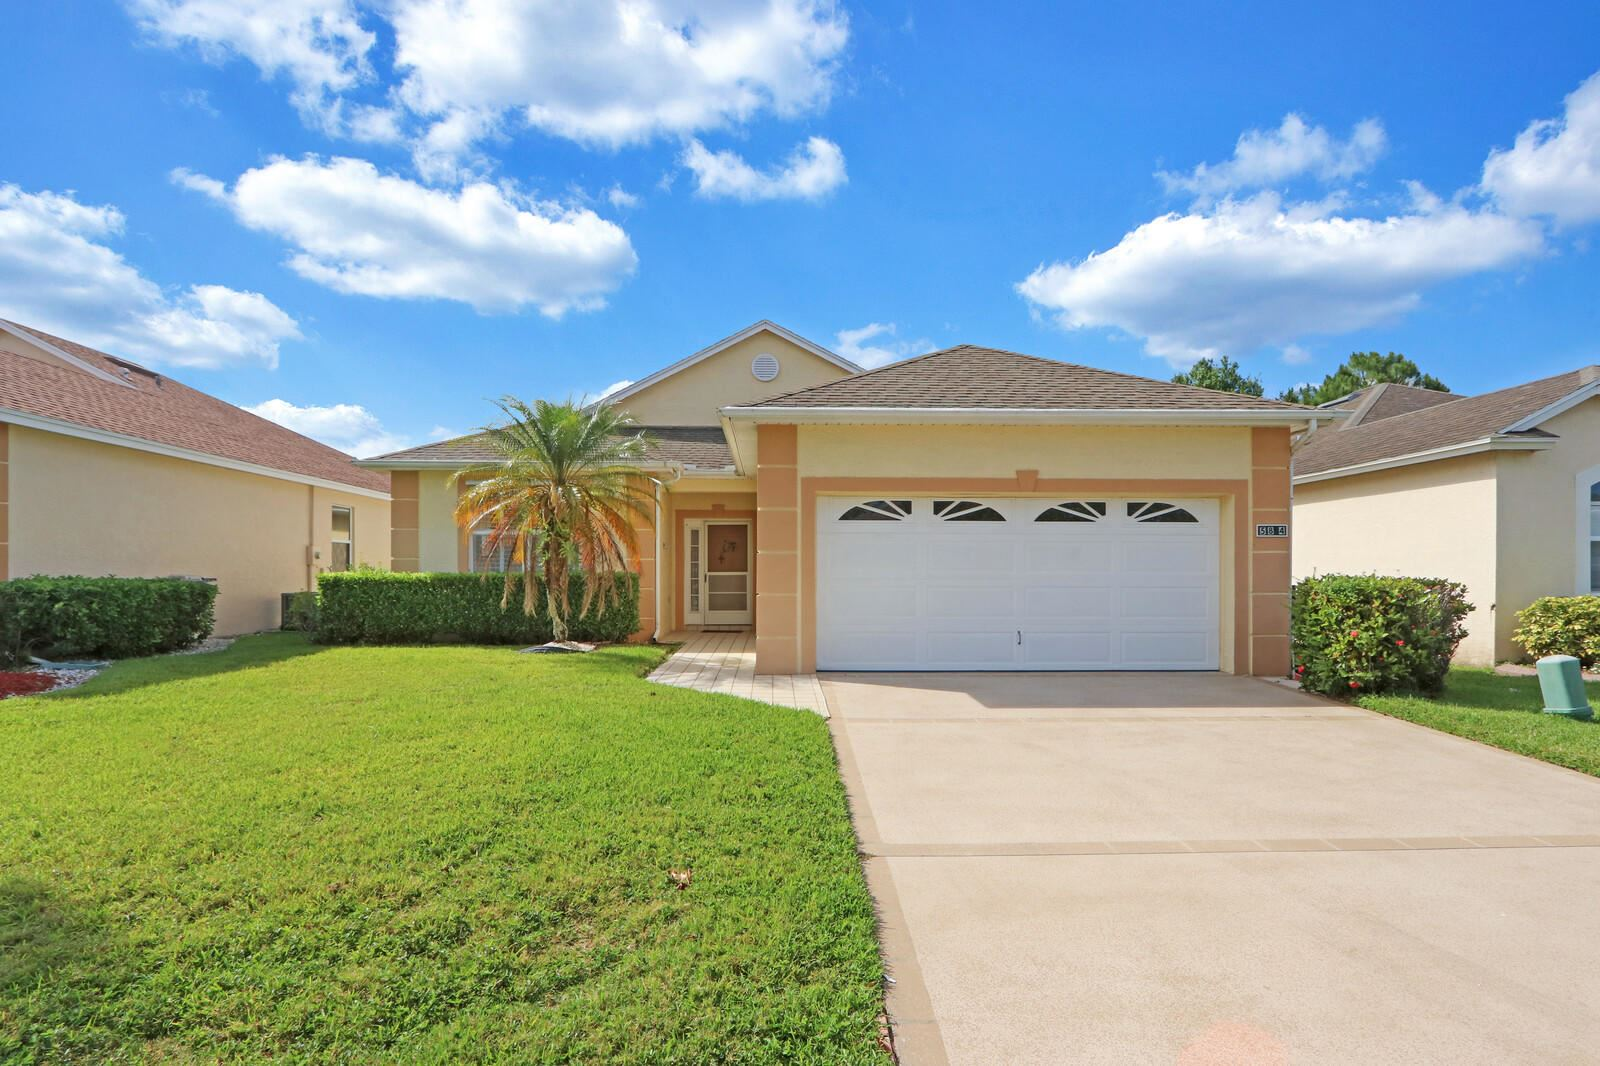 584 NW Cortina Lane, Port Saint Lucie, FL 34986 - MLS#: RX-10711896